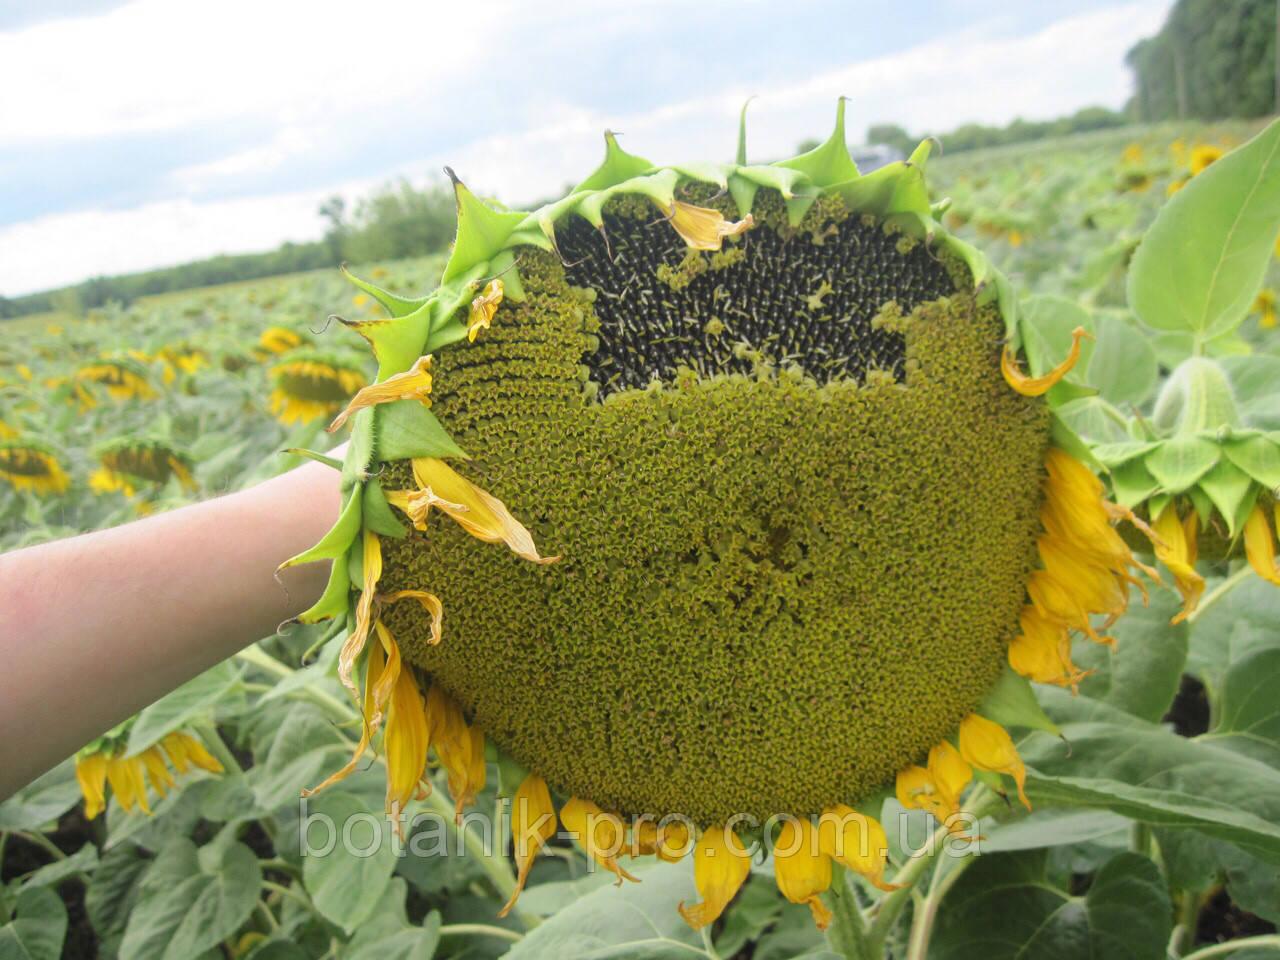 Семена подсолнечника Агроспецпроект Бенето фракция стандарт урожай 2018 года